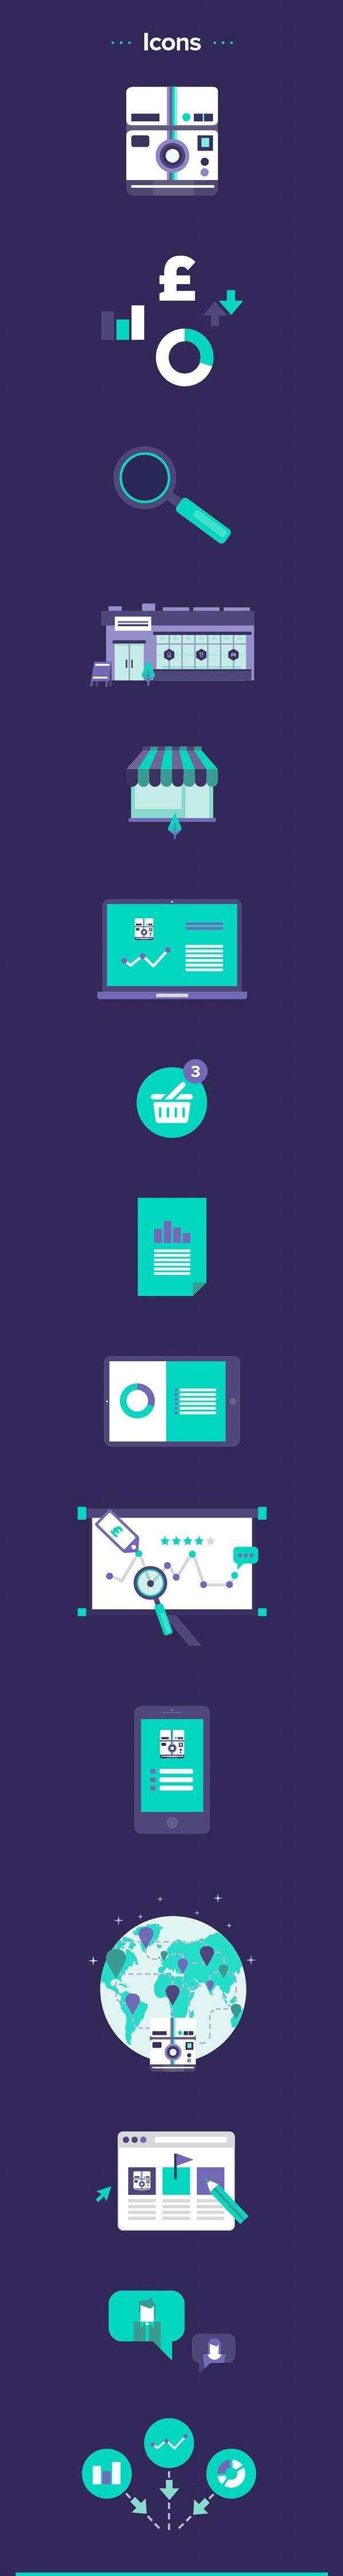 RetailVision // App & Illustration on Behance — Designspiration